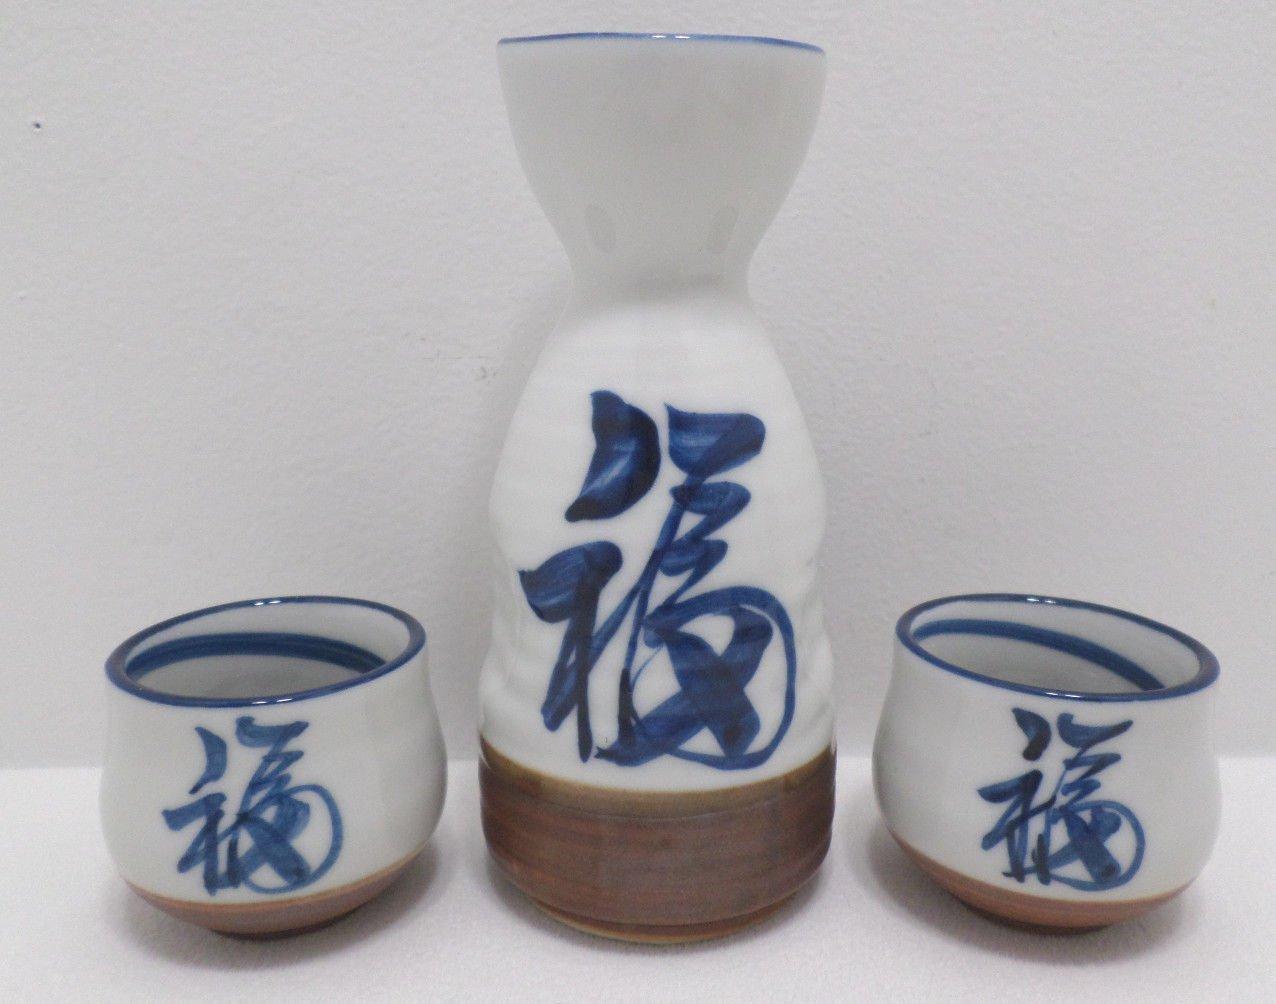 Sake Tea Set Stoneware with a Bulls Eye Pattern on the inside